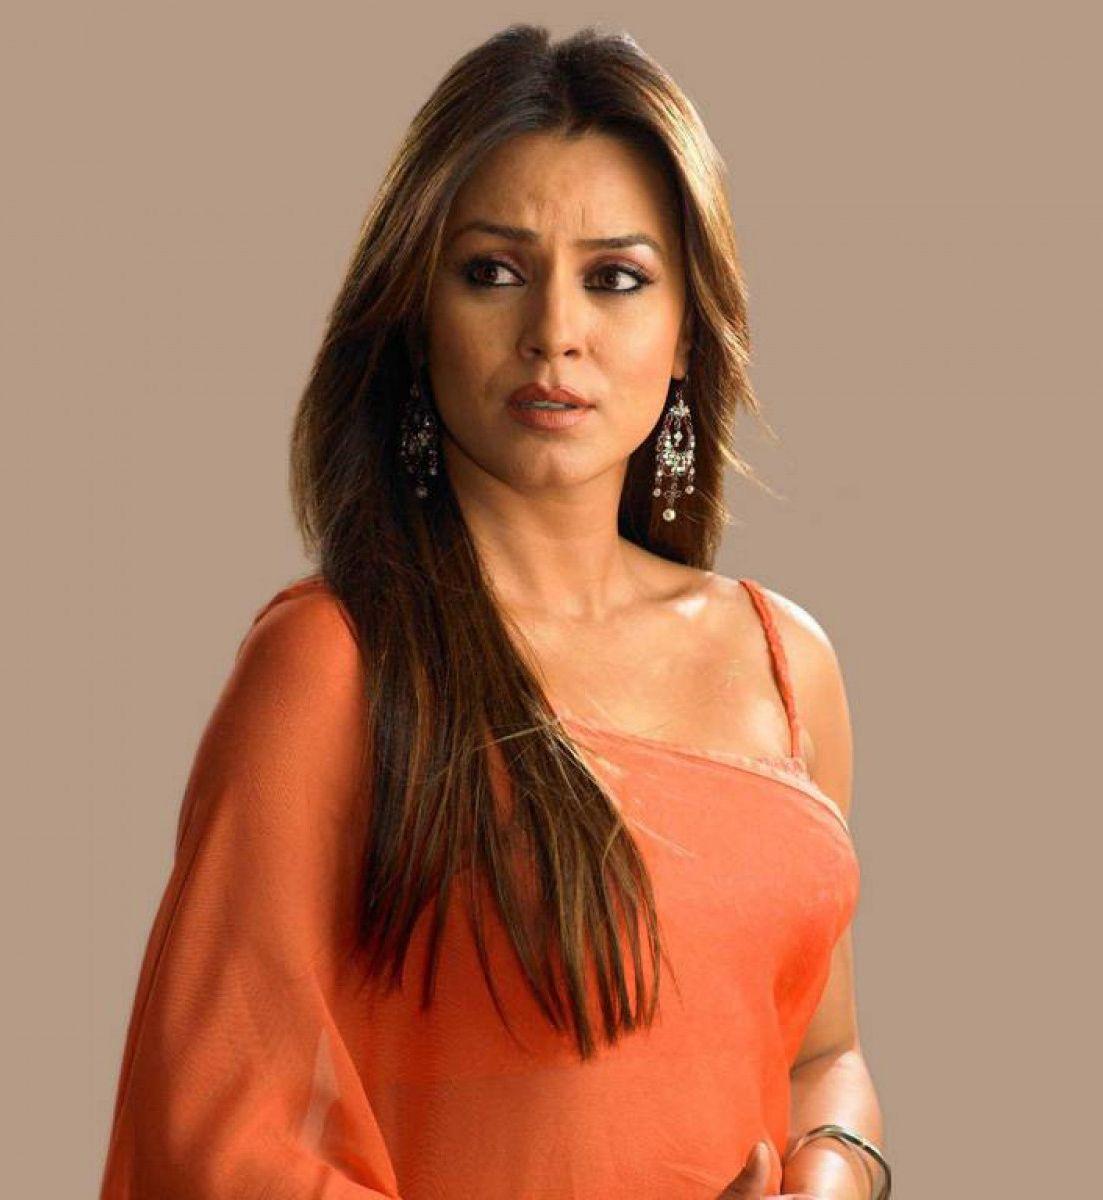 Mahima choudhri nude fucking sexy image — img 1